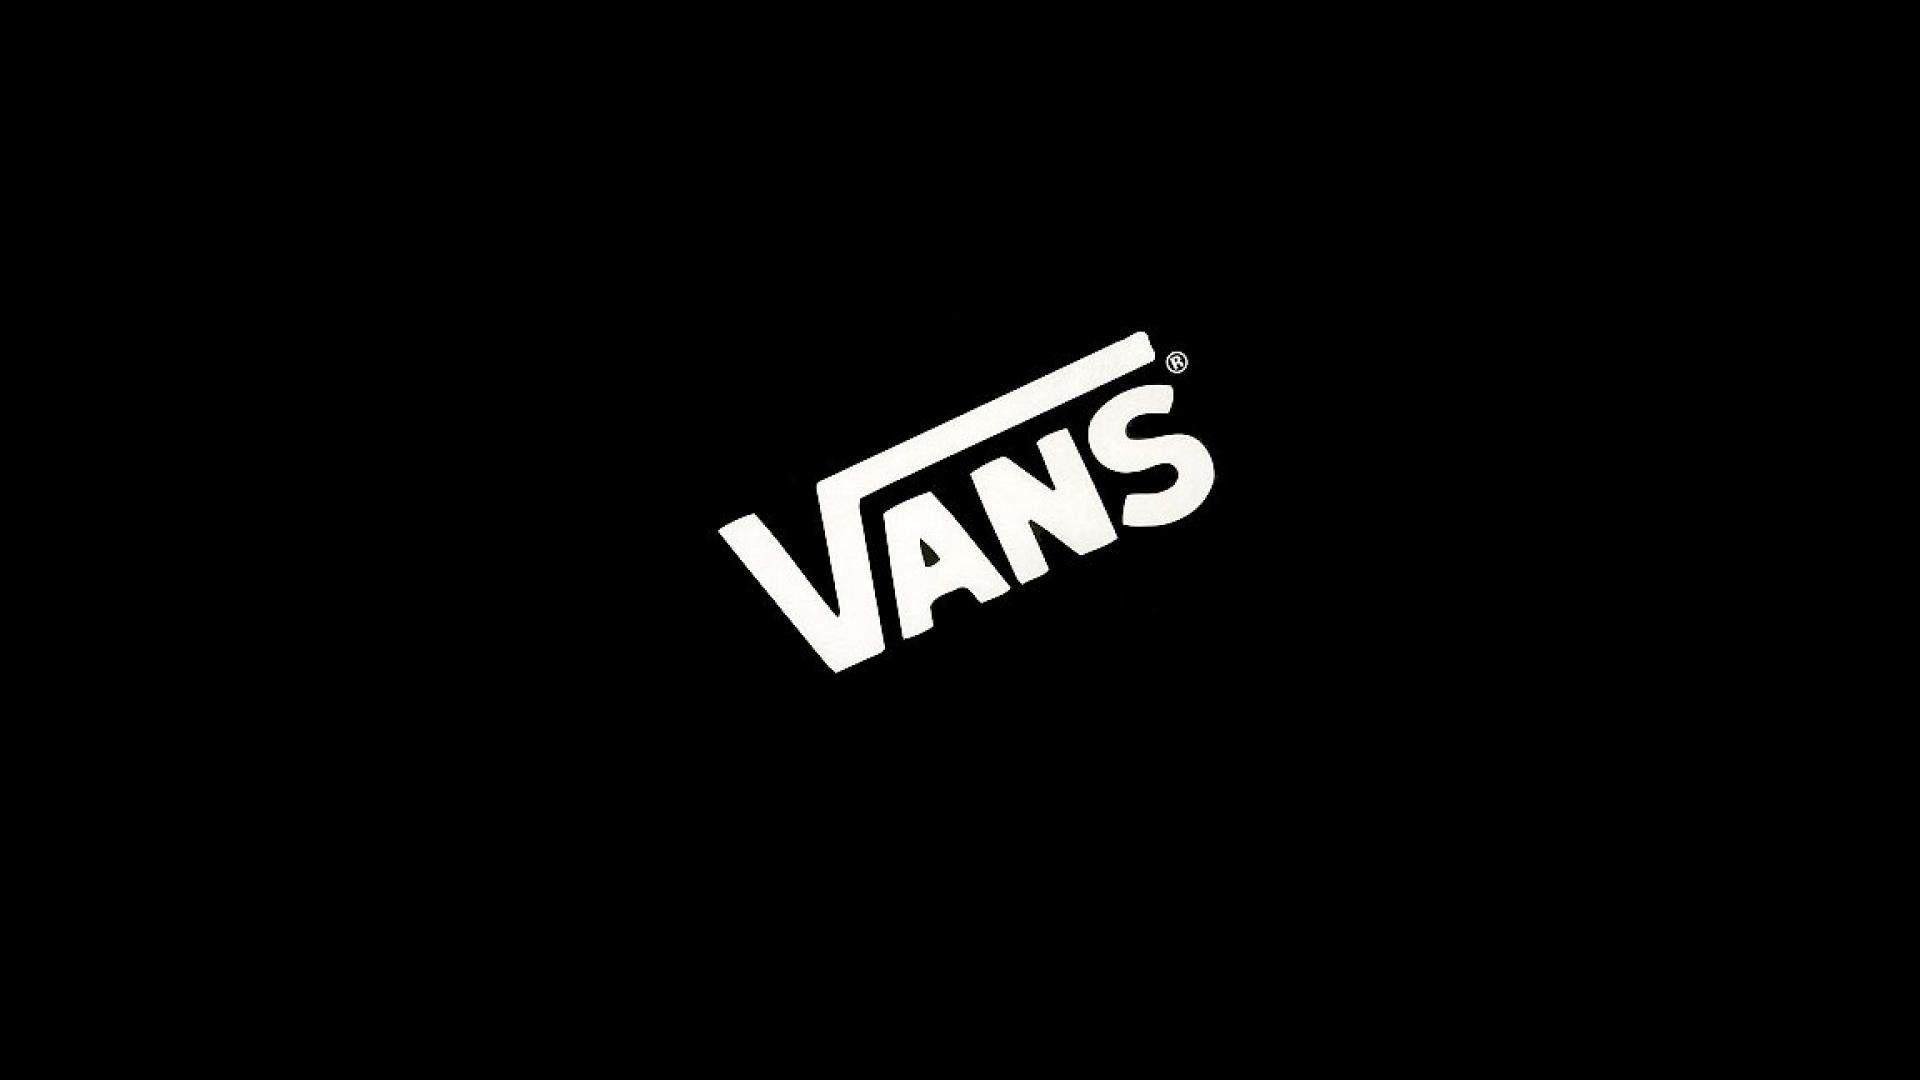 Cool Vans Wallpapers Top Free Cool Vans Backgrounds Wallpaperaccess